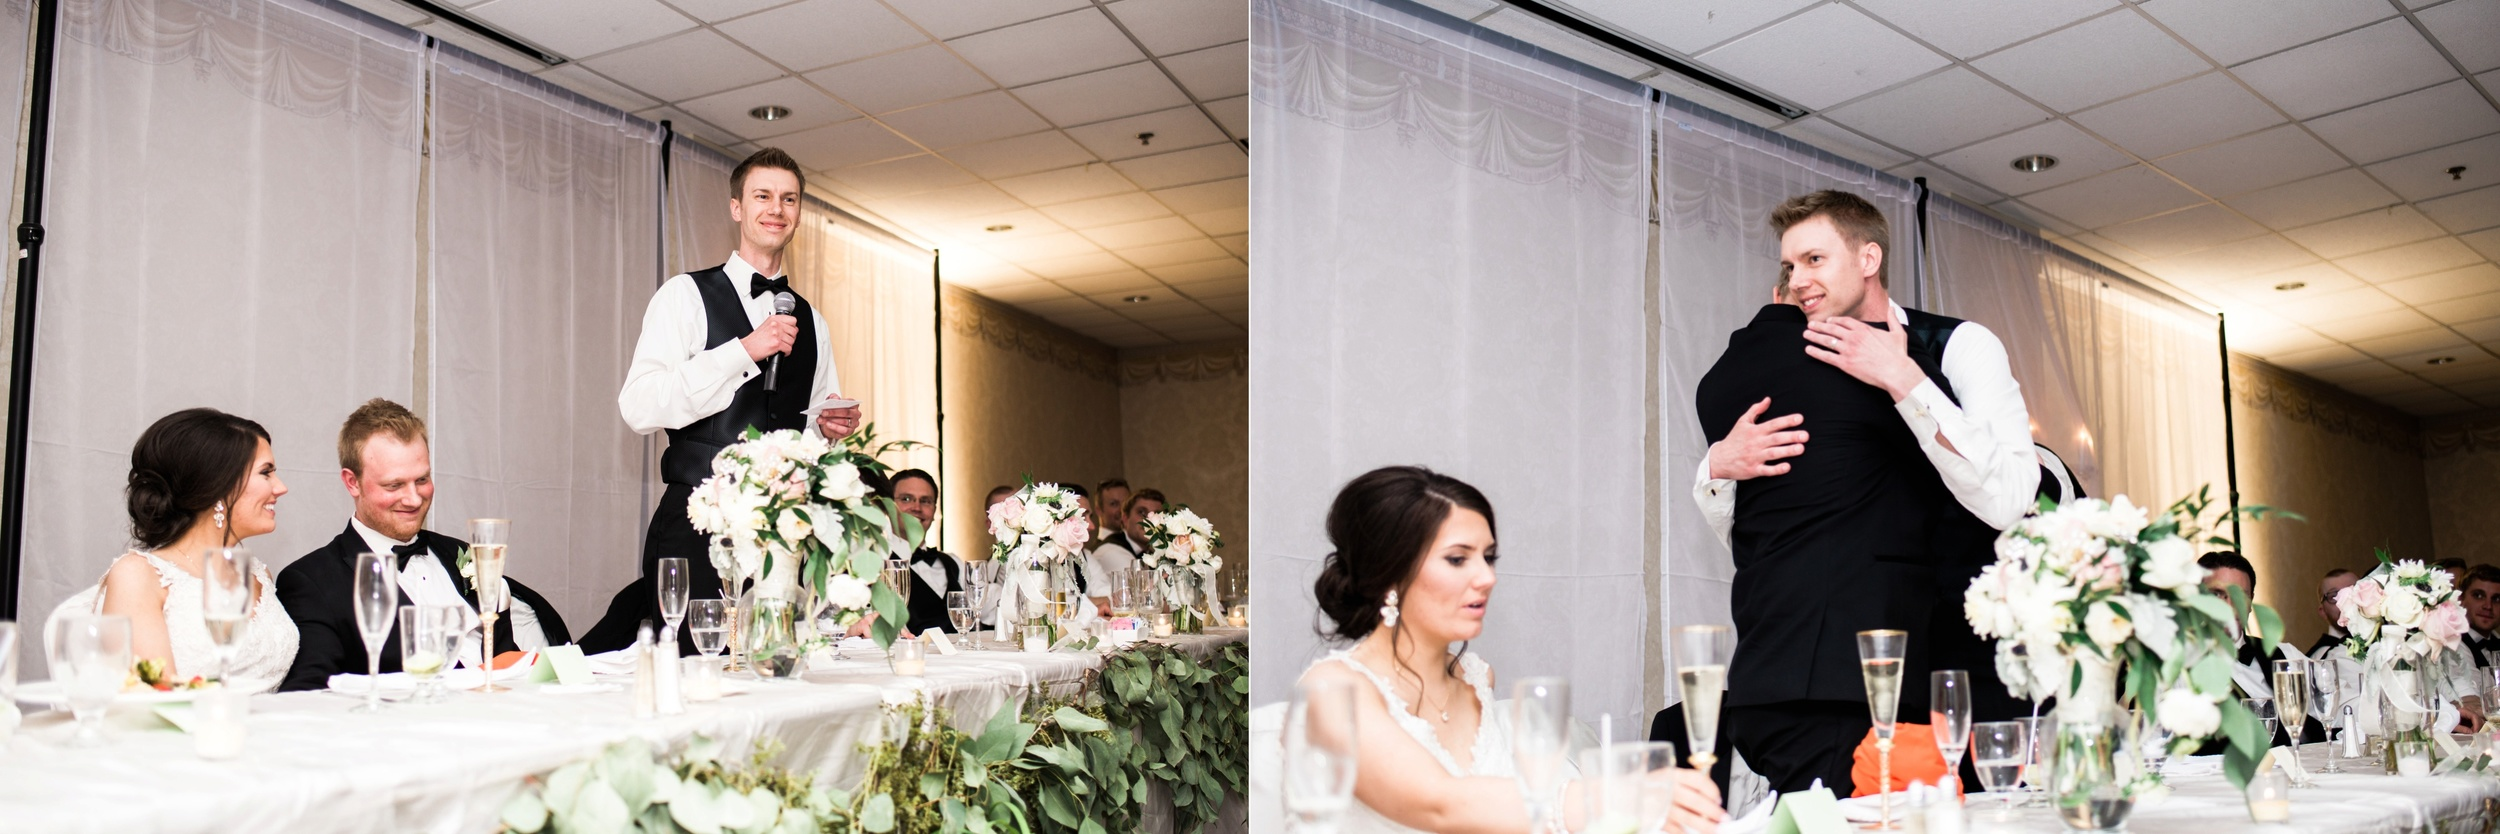 Downtown Des Moines Wedding Photographer_2136.jpg